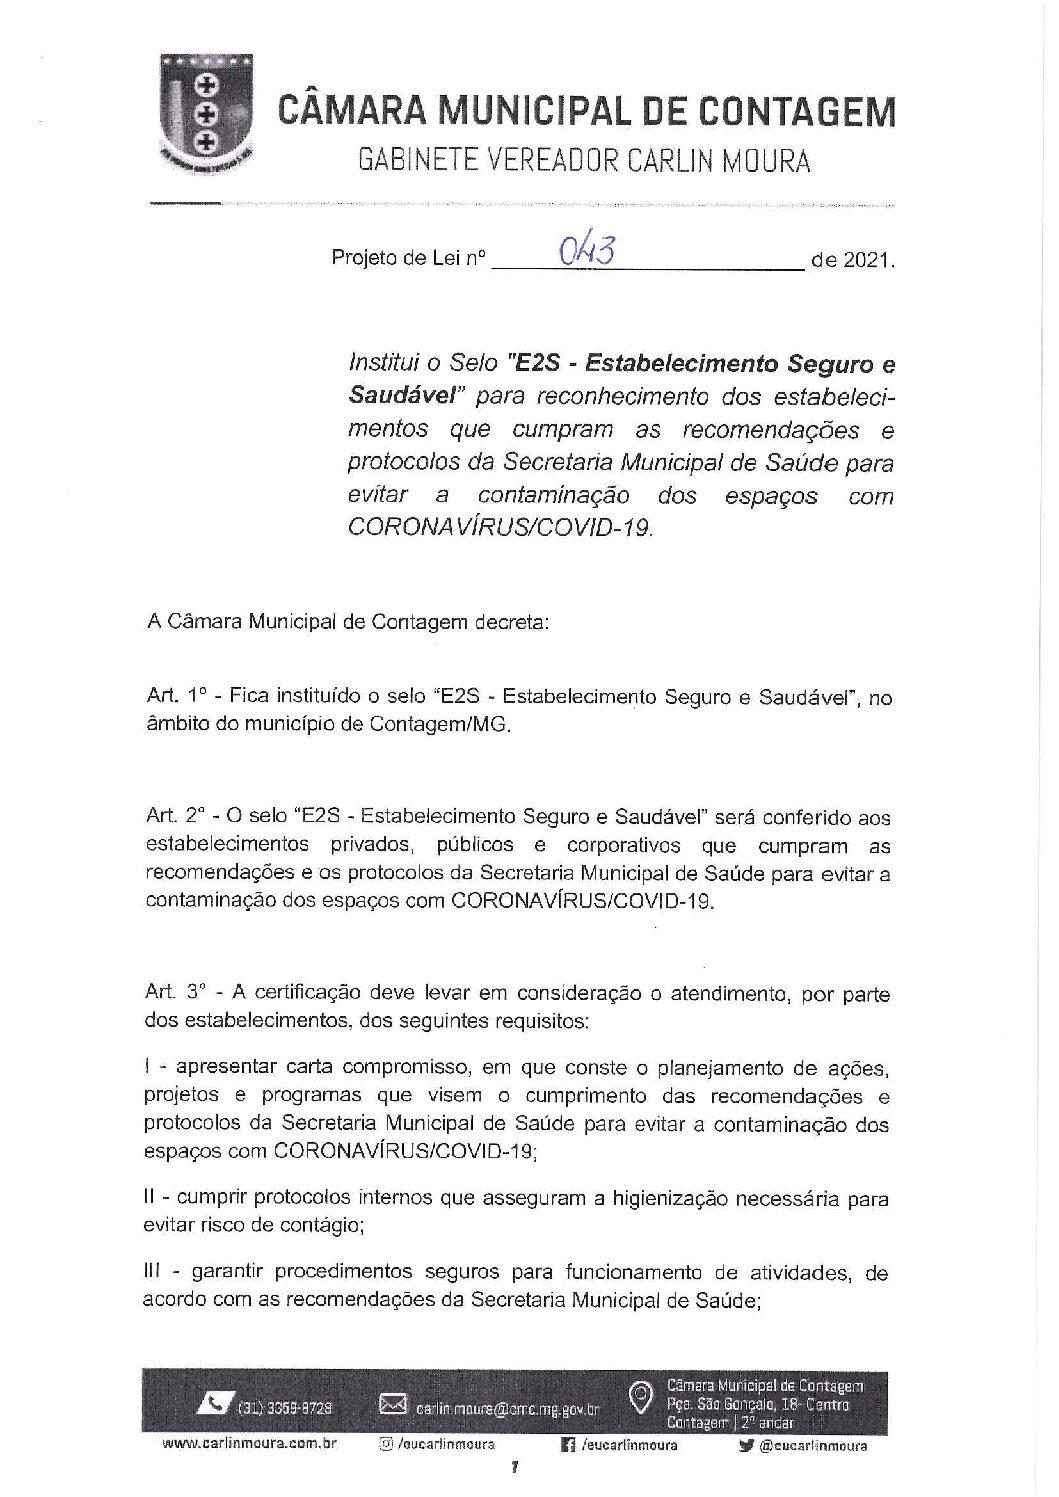 Projeto de lei 0043/2021